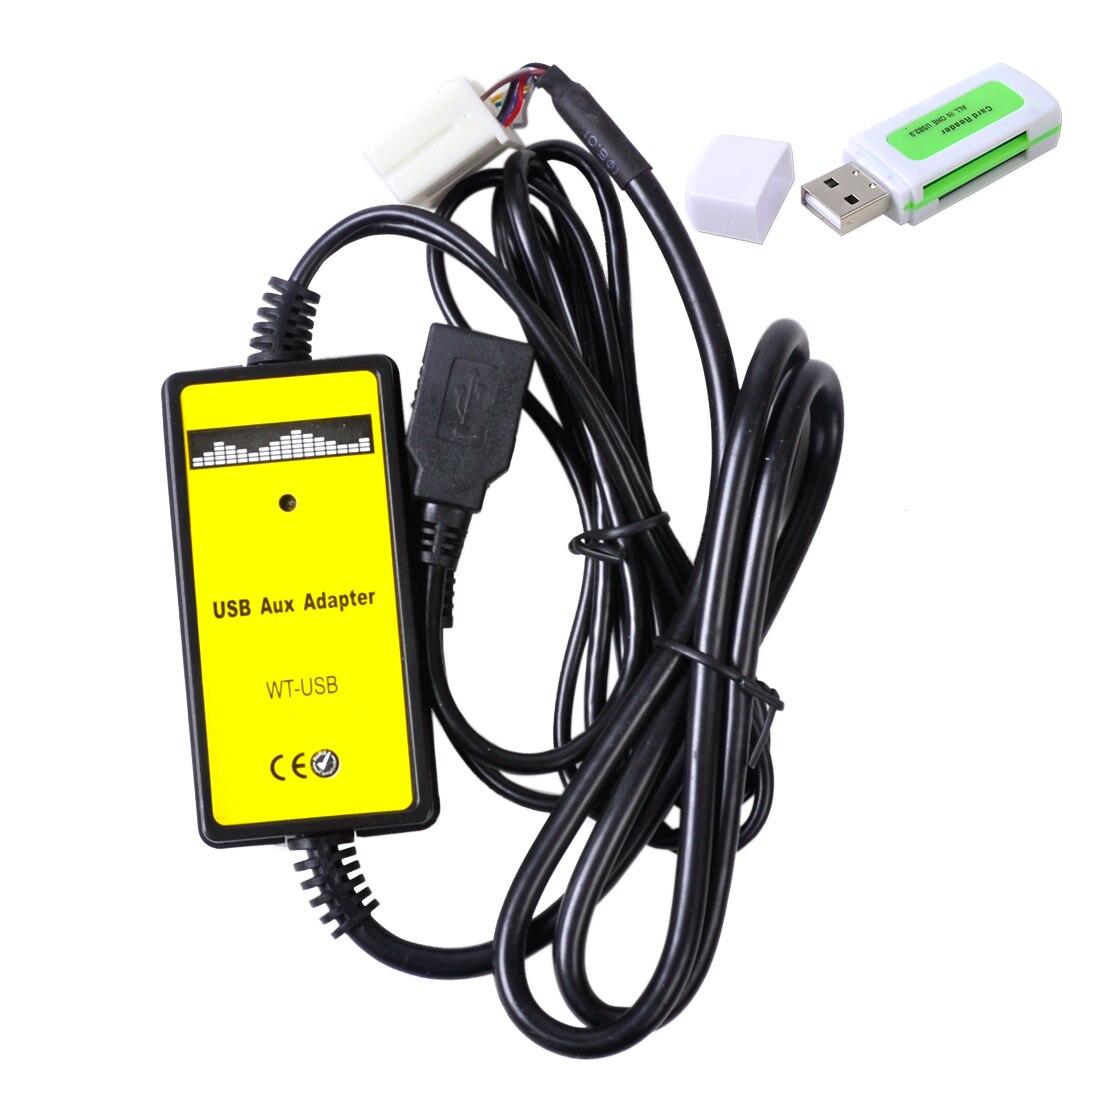 CITALL автомобиля AUX Вход MP3 плеер CD Интерфейс адаптер Changer кабель USB Автомобильное чтения для Honda Accord Civic CRV Odyssey s2000 City